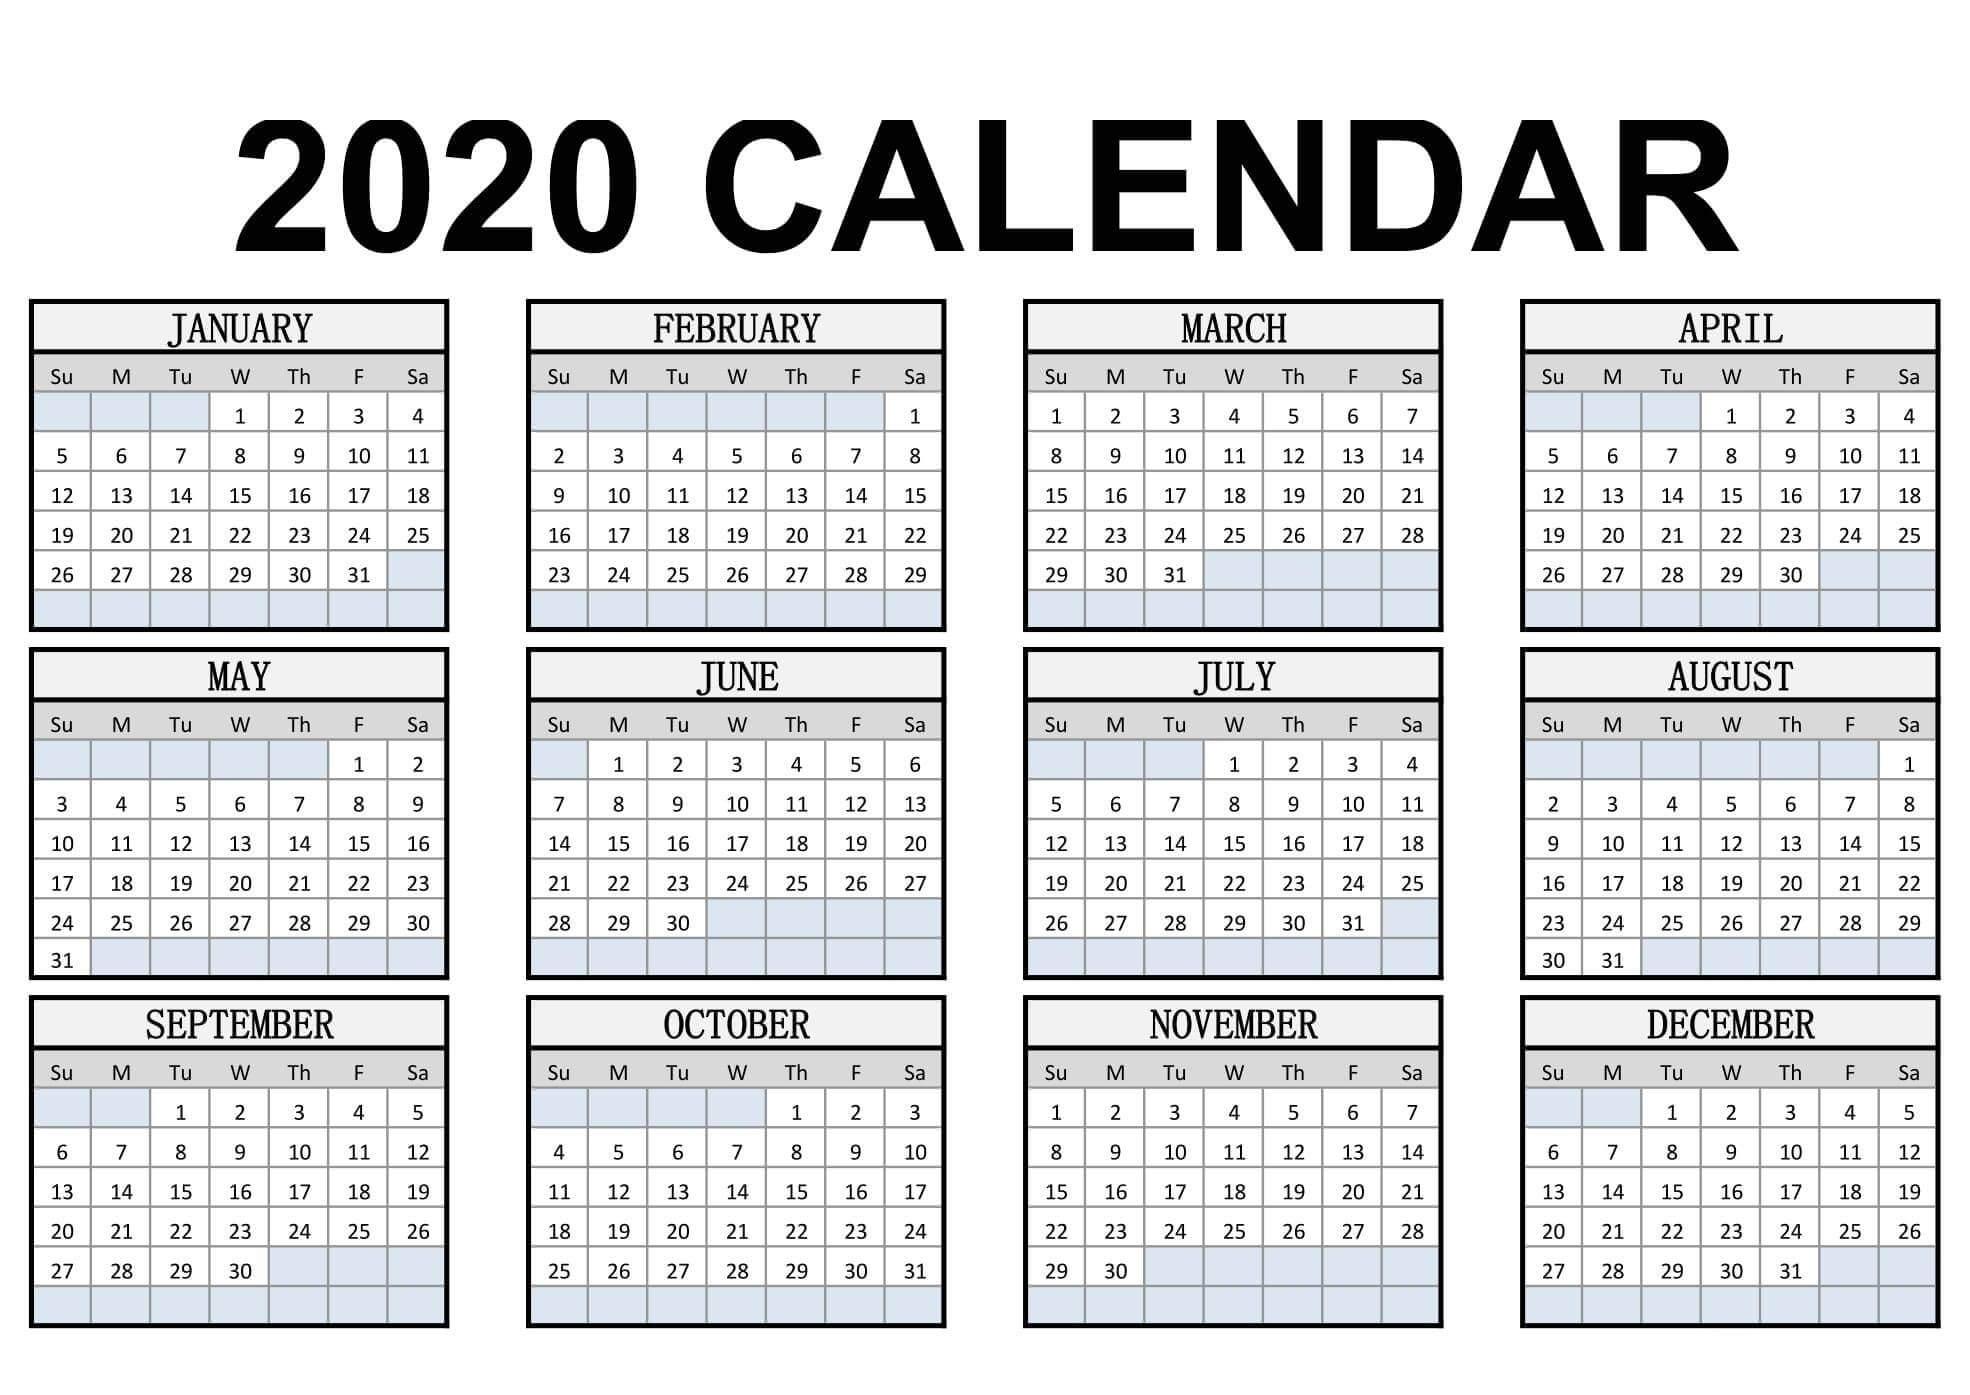 Calendar Year 2020 Holidays Template - 2019 Calendars For 2020 Yearly Calendar Printable